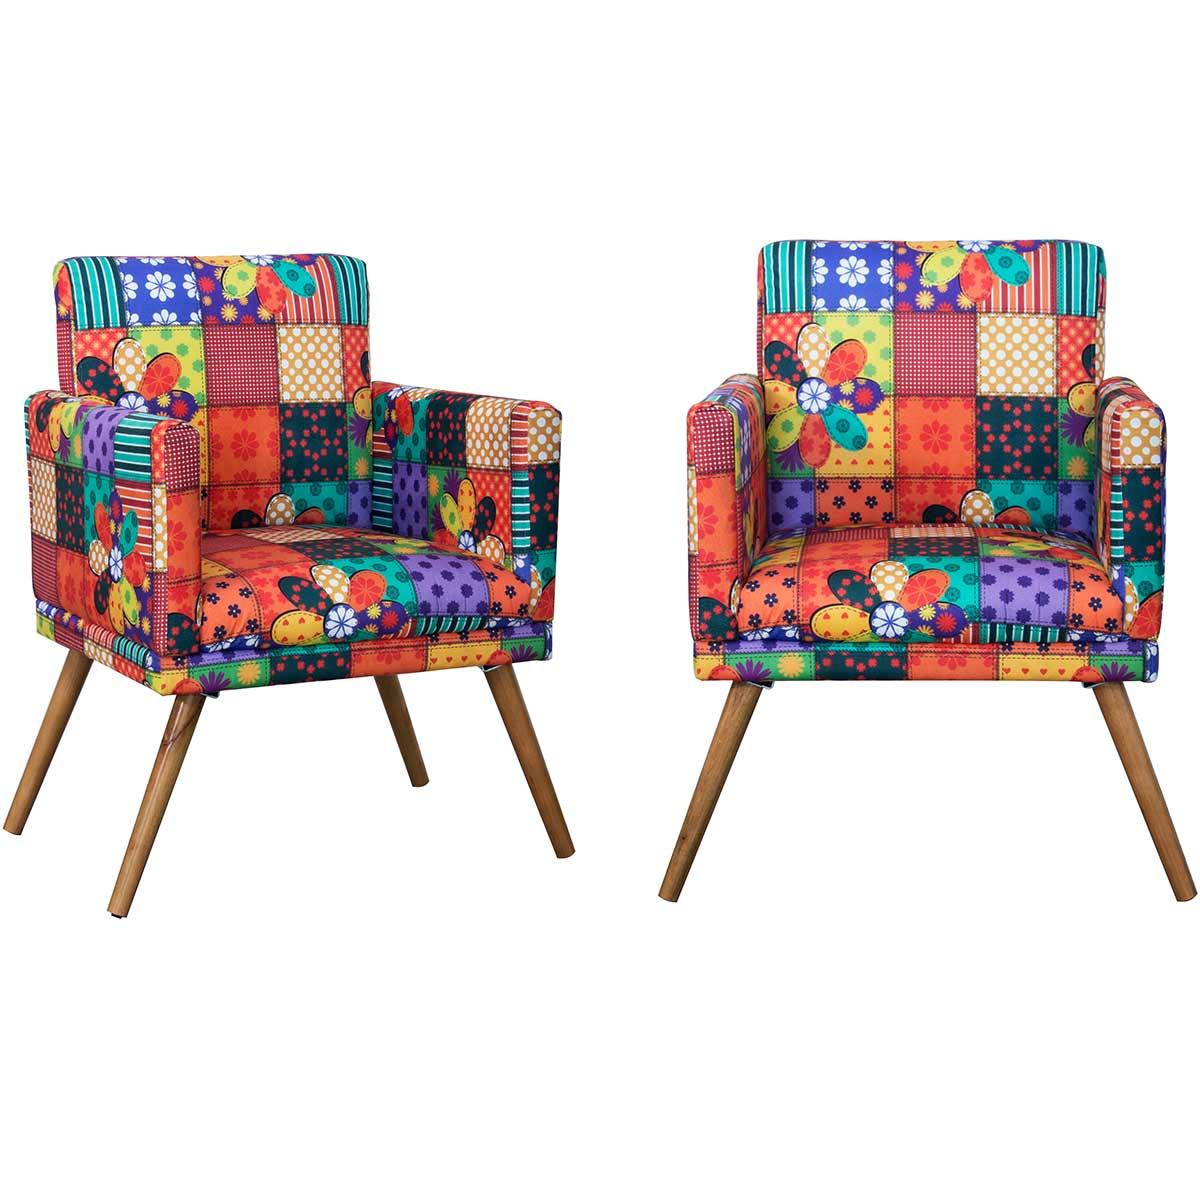 Kit 2 Poltronas Decorativas New Nina Pé Palito Primavera